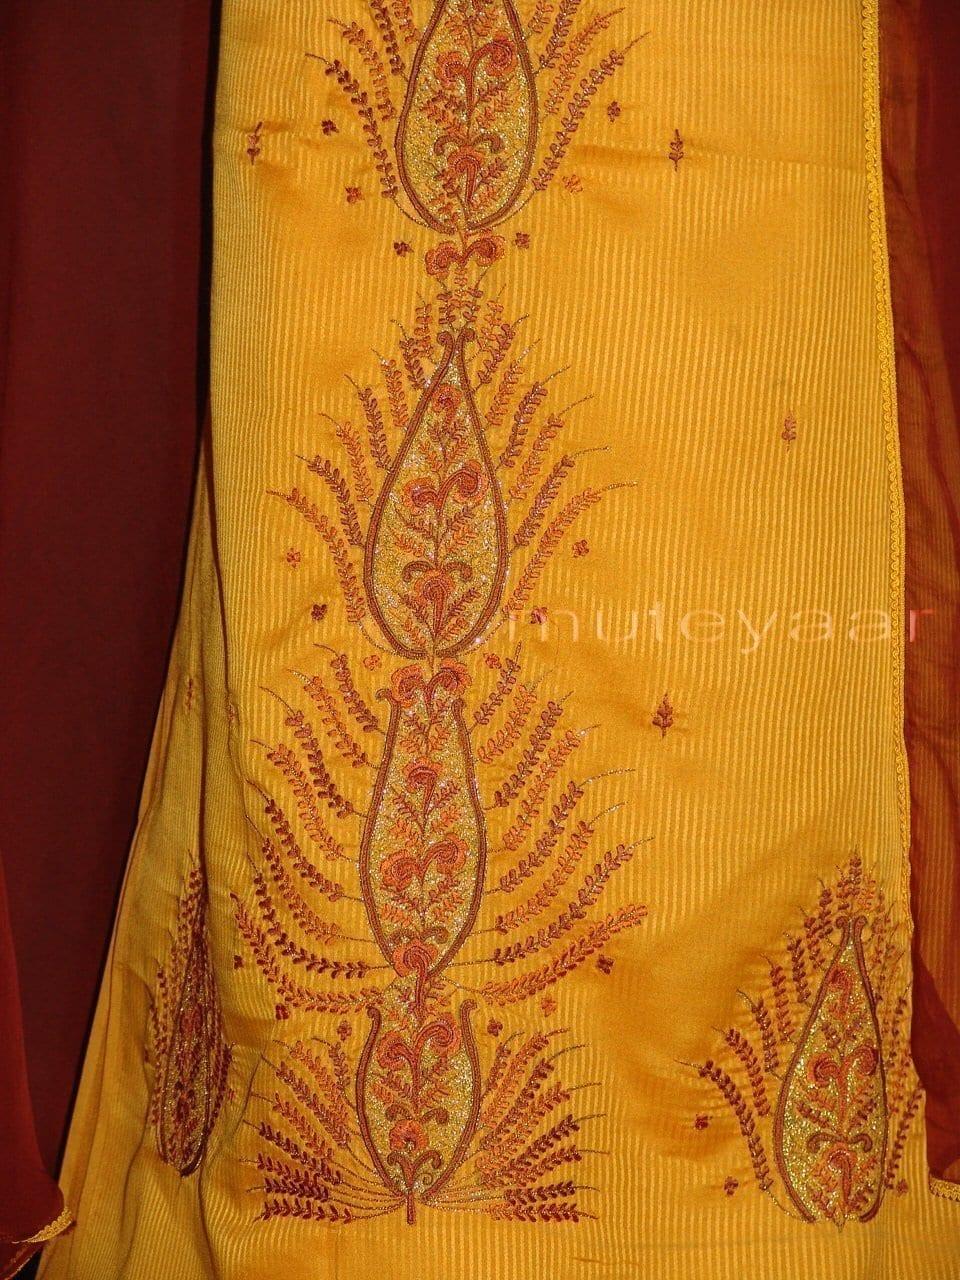 Pure Cotton Embroidered Salwar Suit PURE CHIFFON Dupatta RM217 2